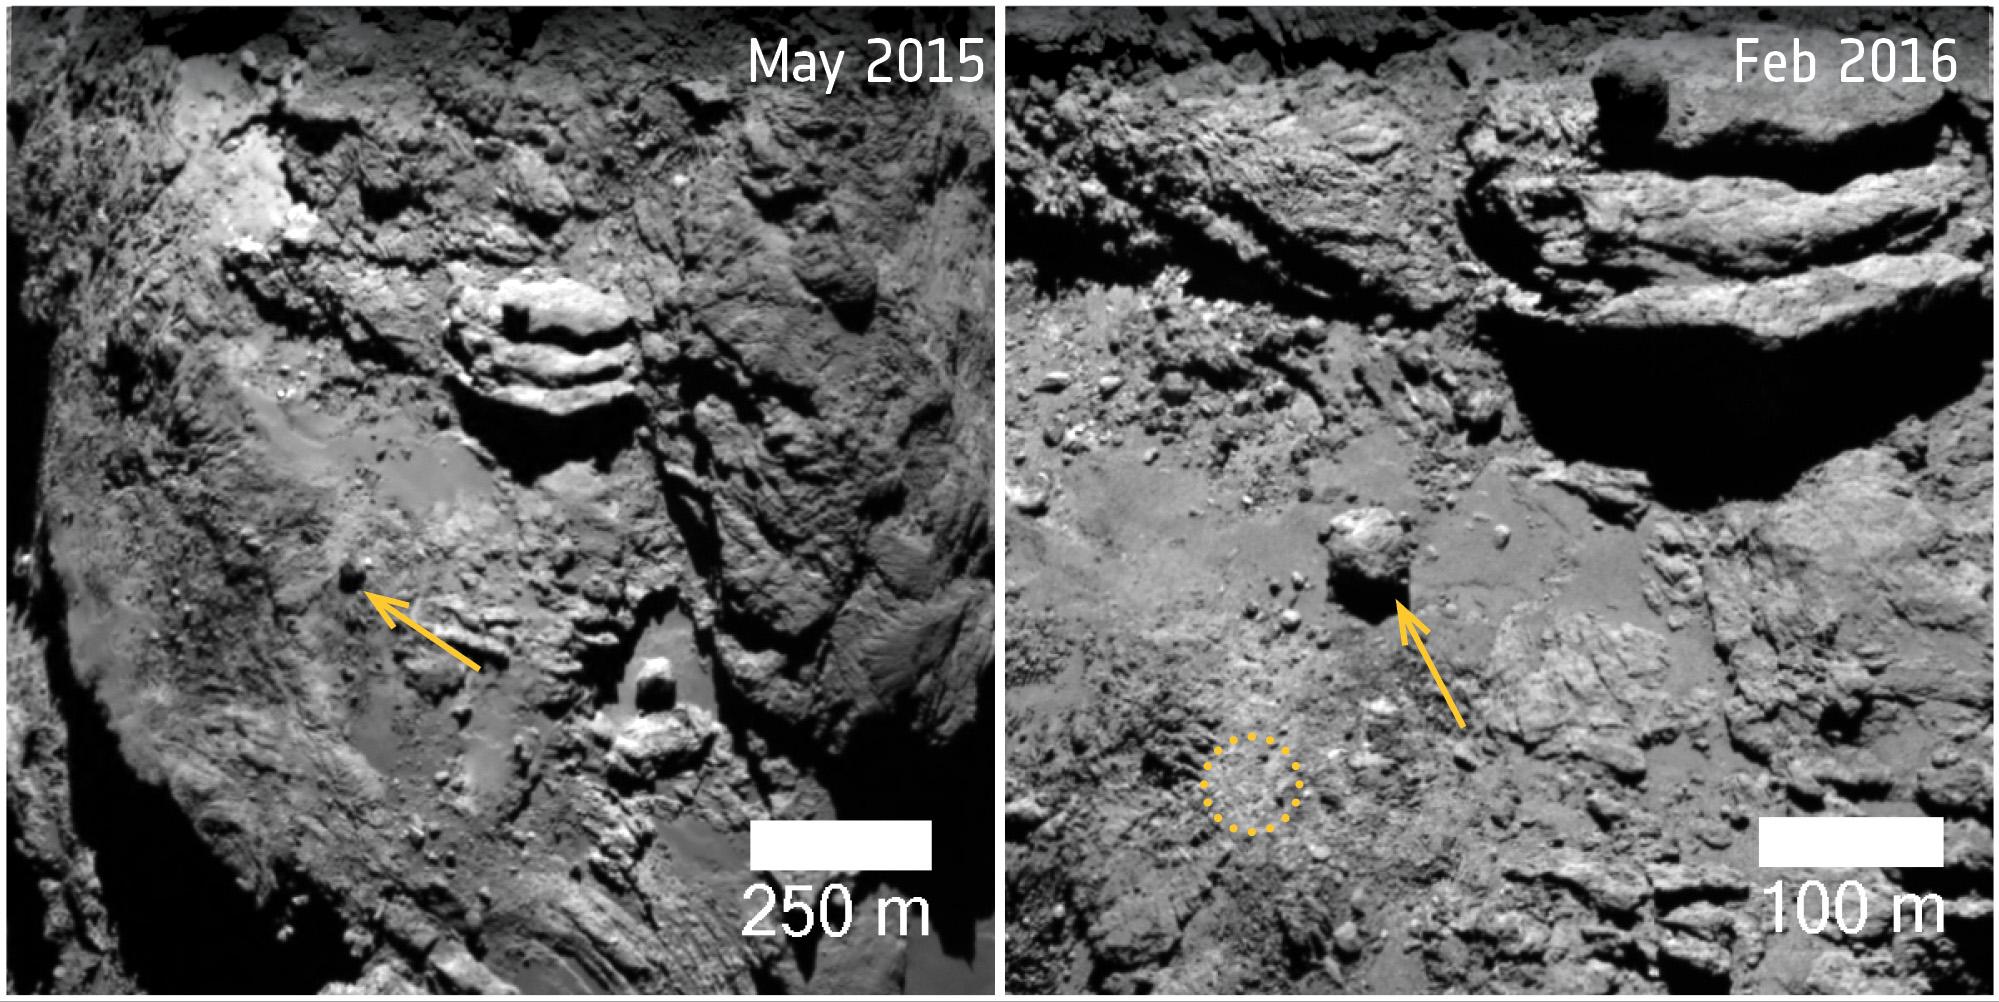 1567215191701-ESA_Rosetta_CometChanges_MovingBoulder.jpg